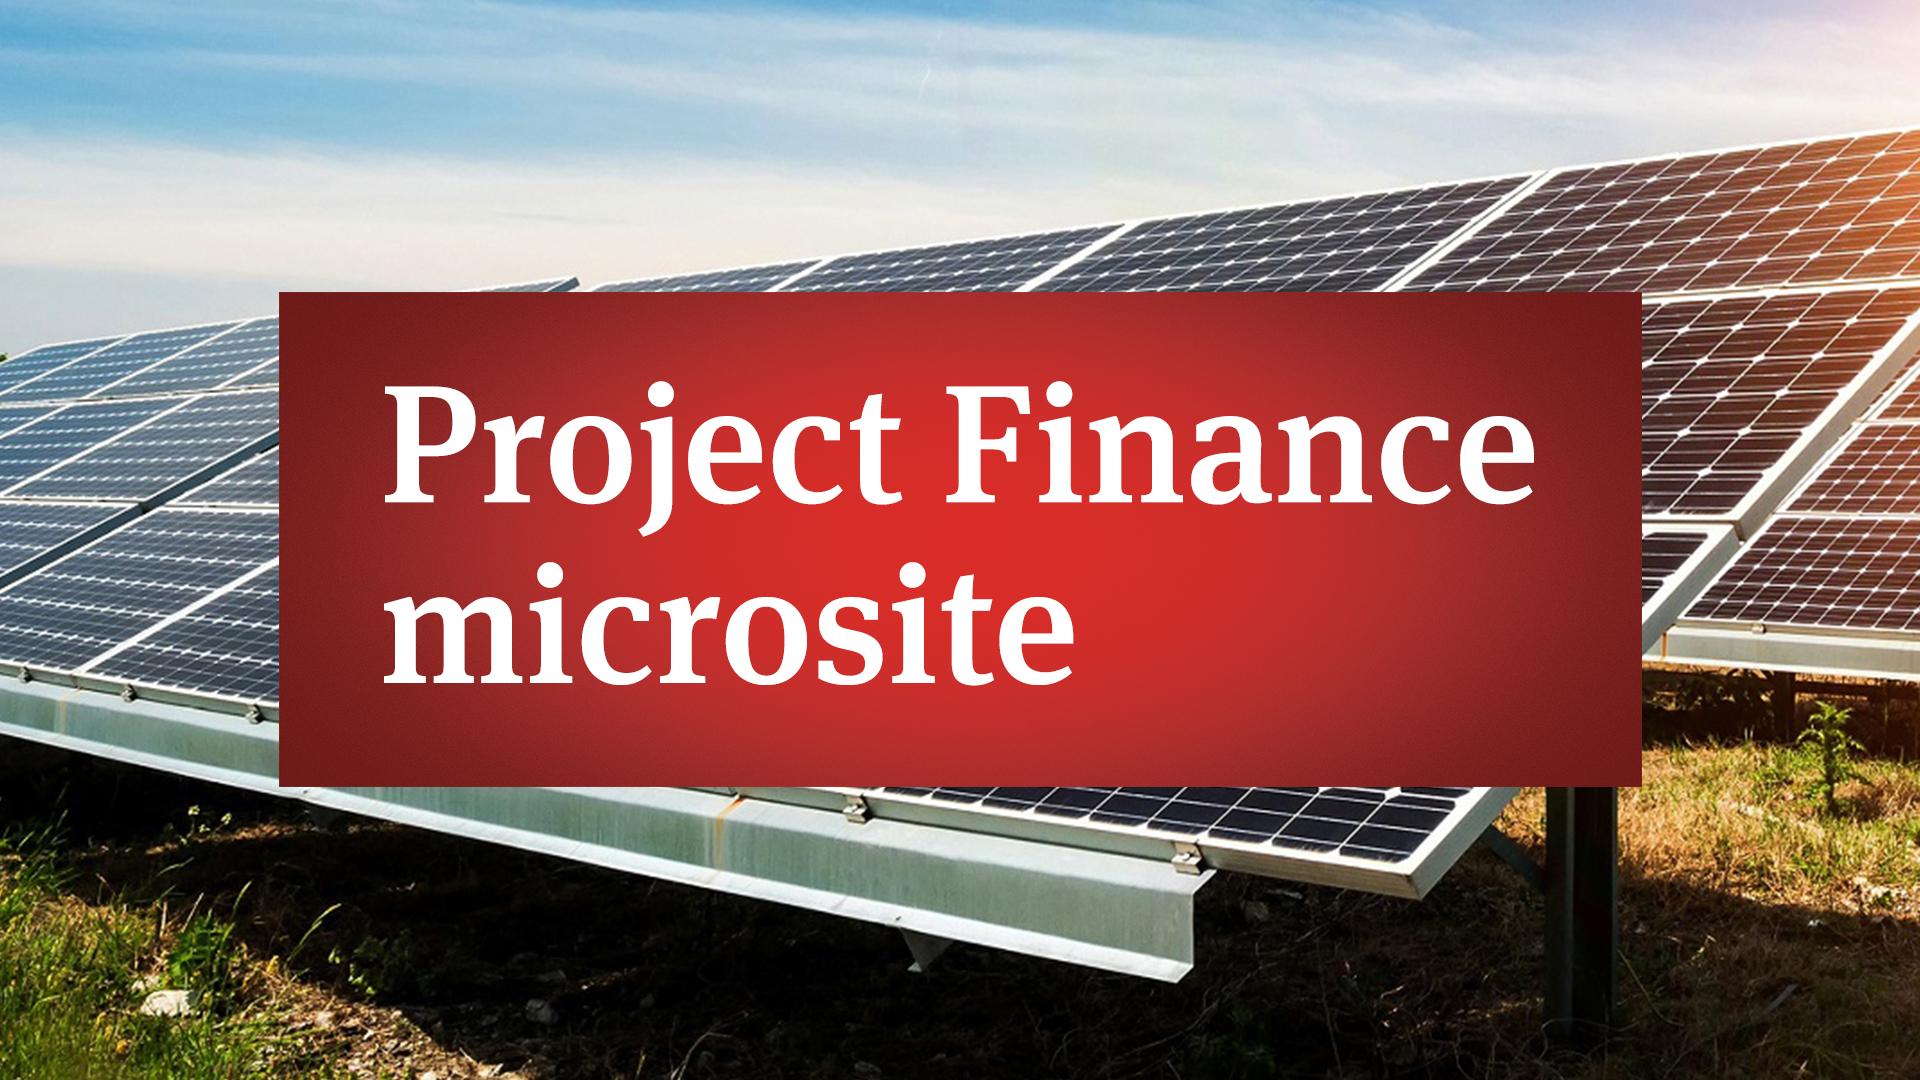 Project Finance microsite